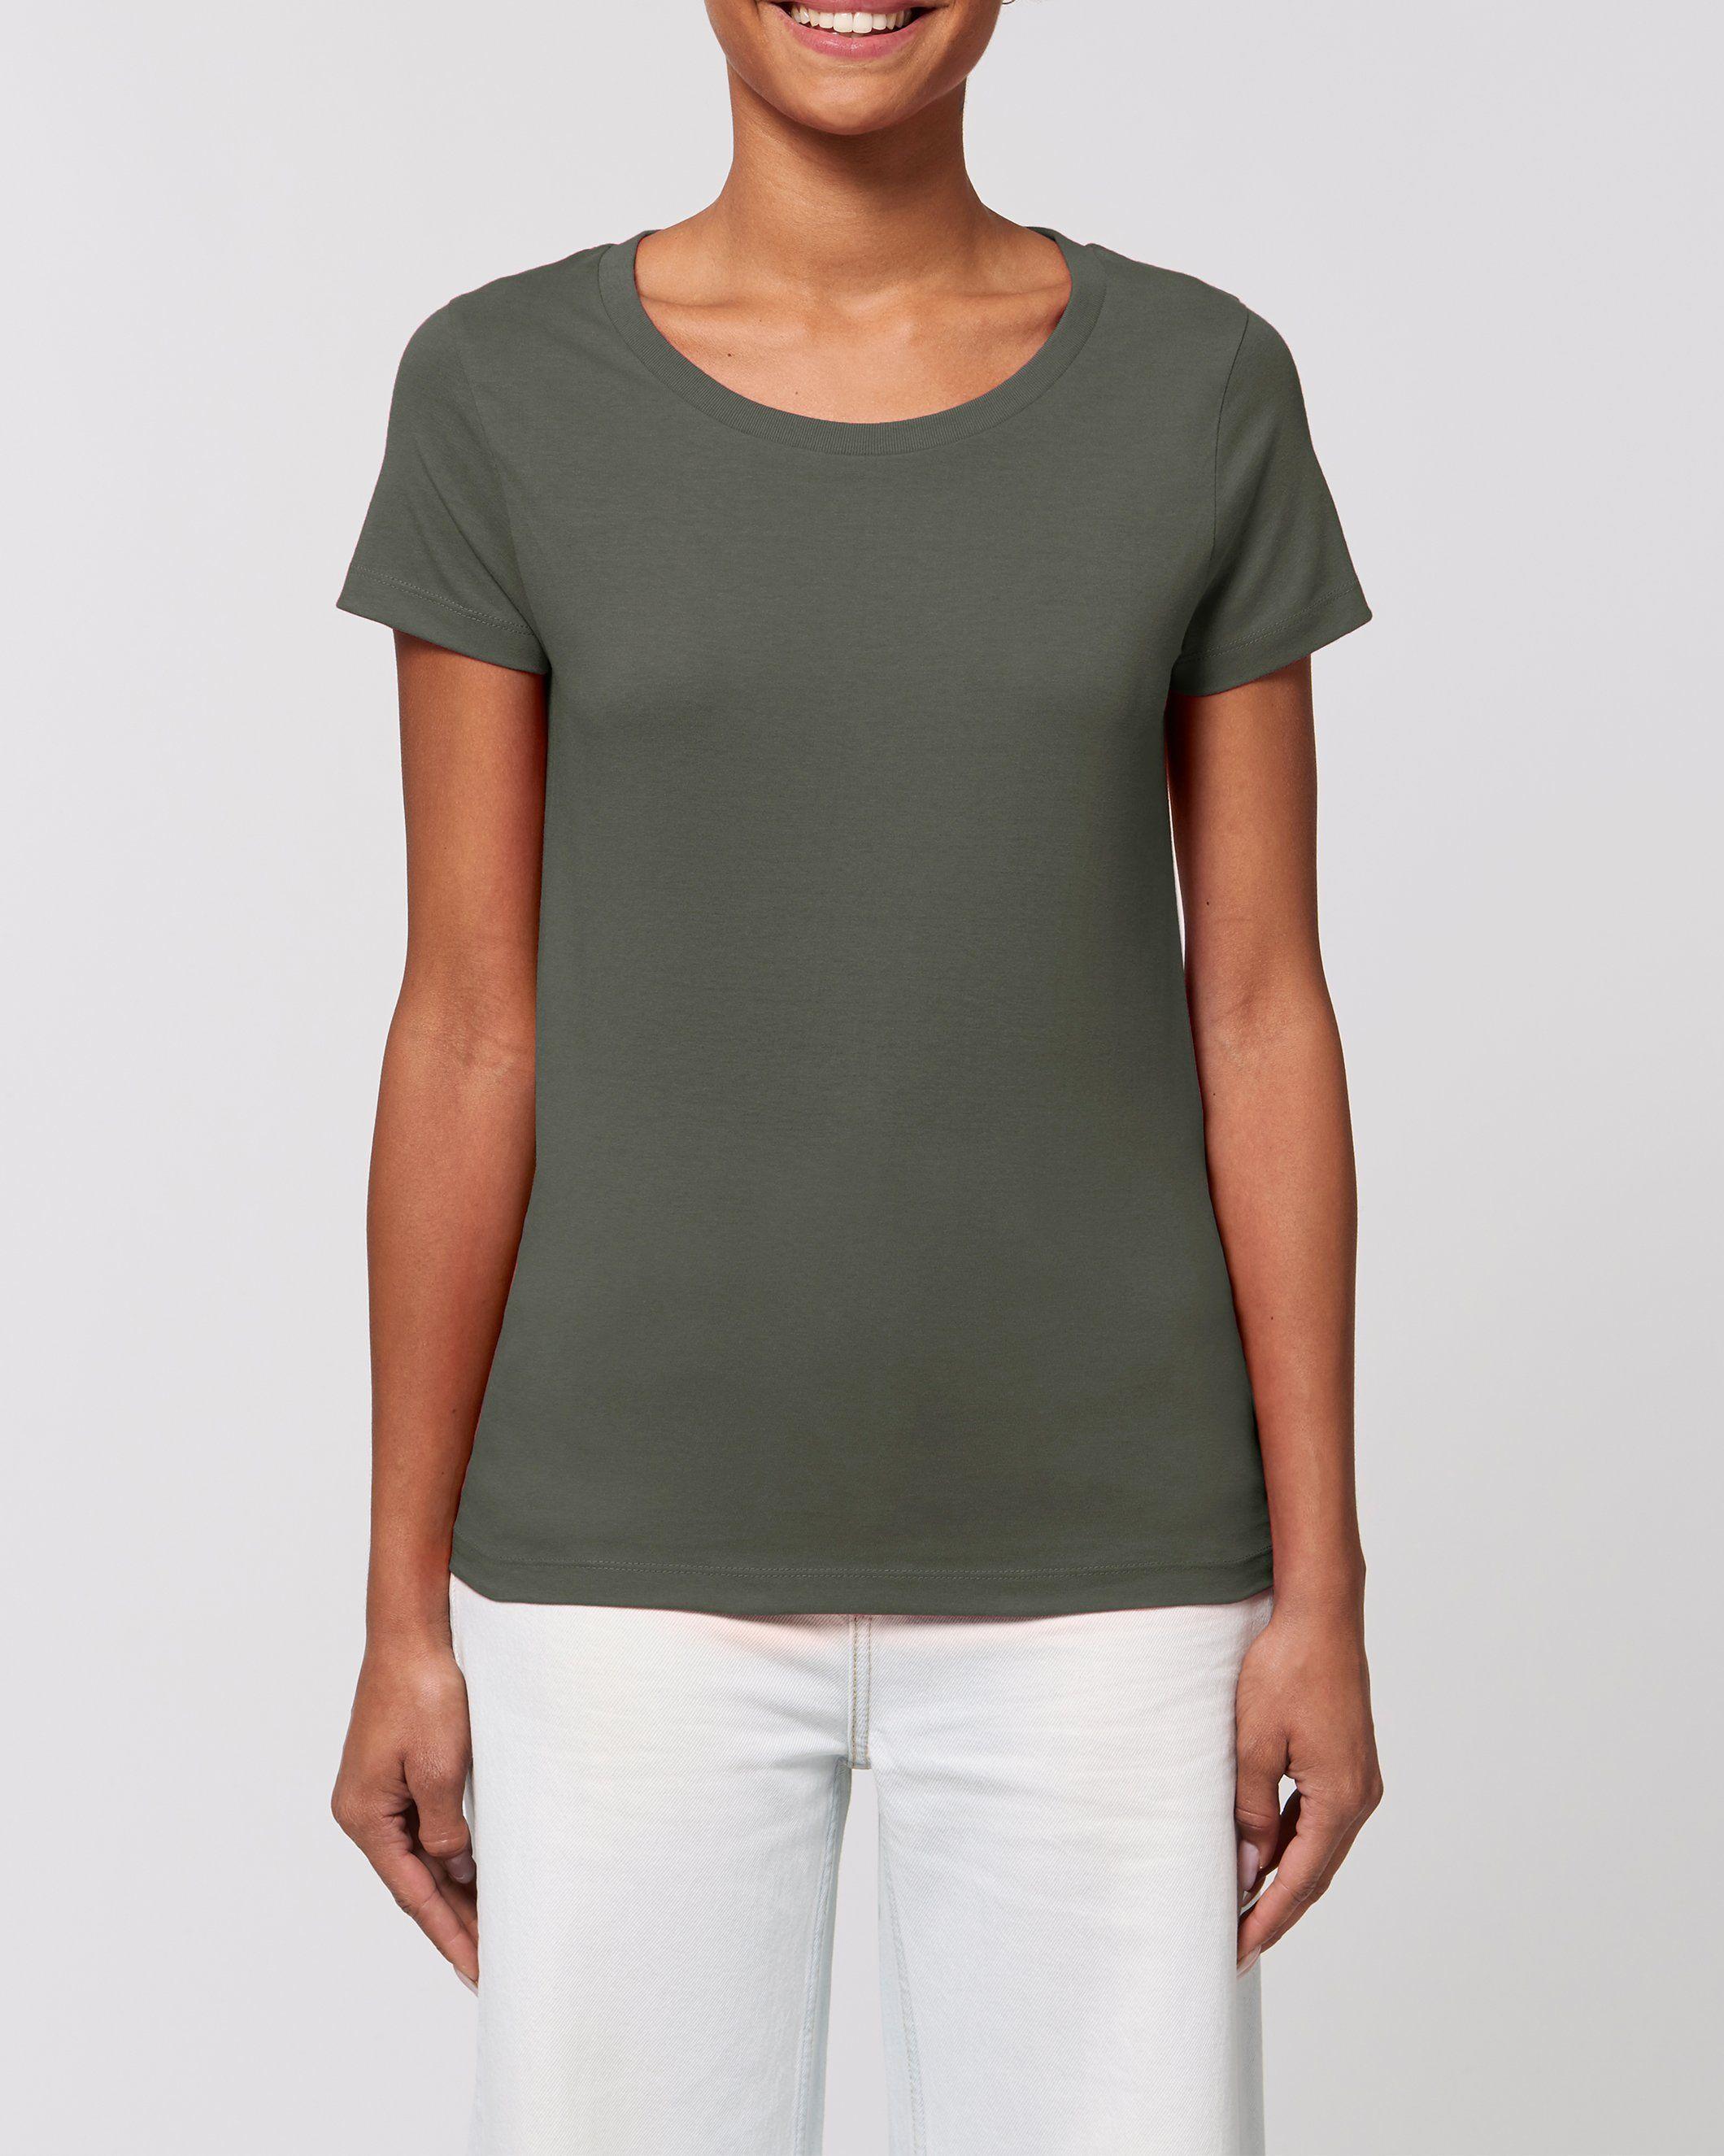 Laya Women's T-Shirt in Khaki